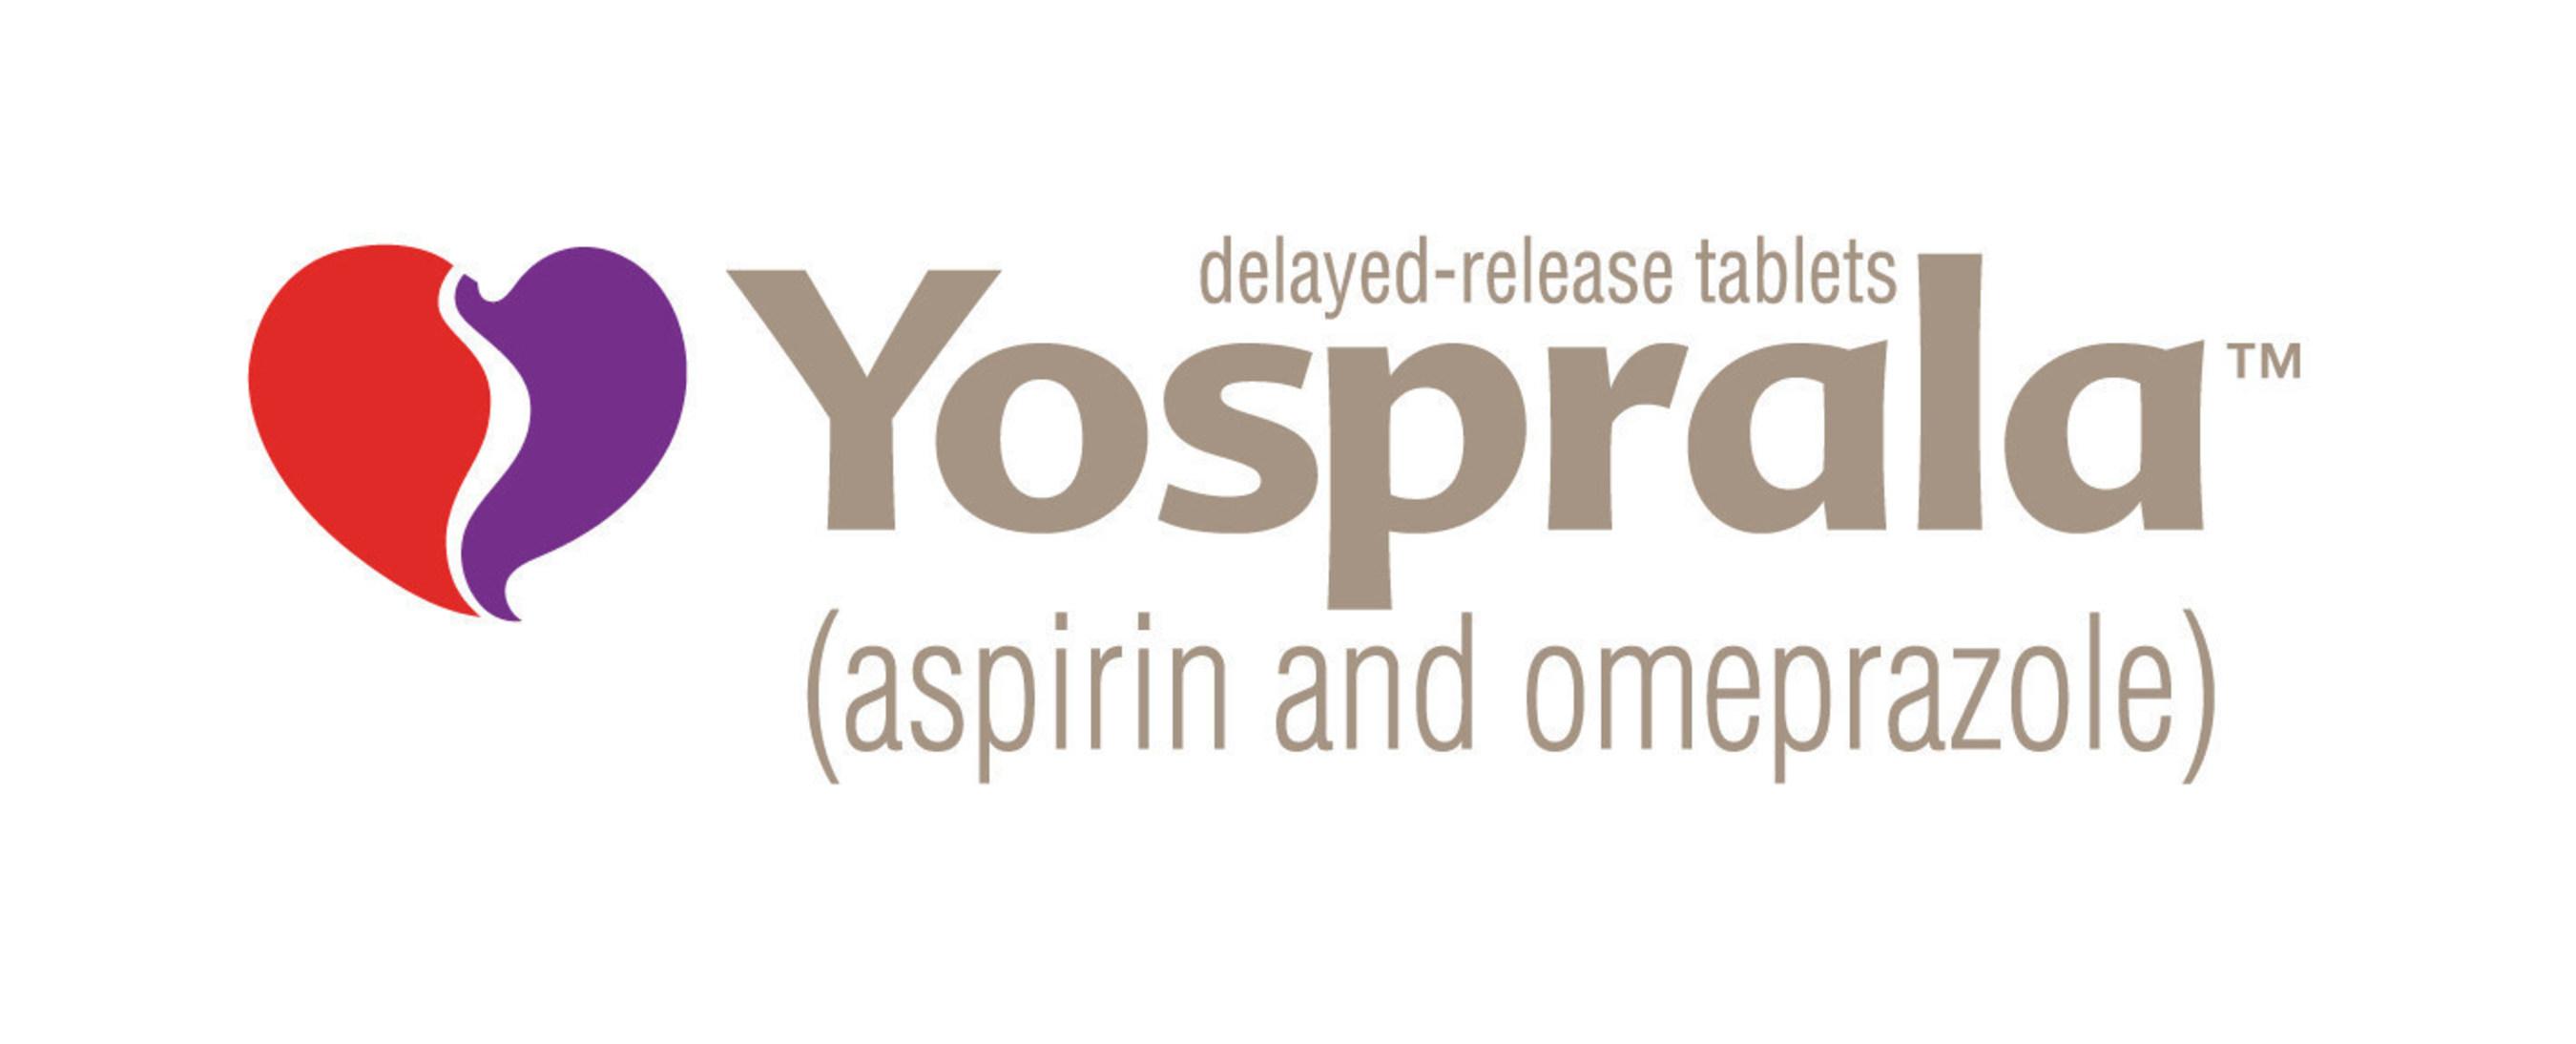 Aralez Announces FDA Approval Of YOSPRALA For Secondary Prevention